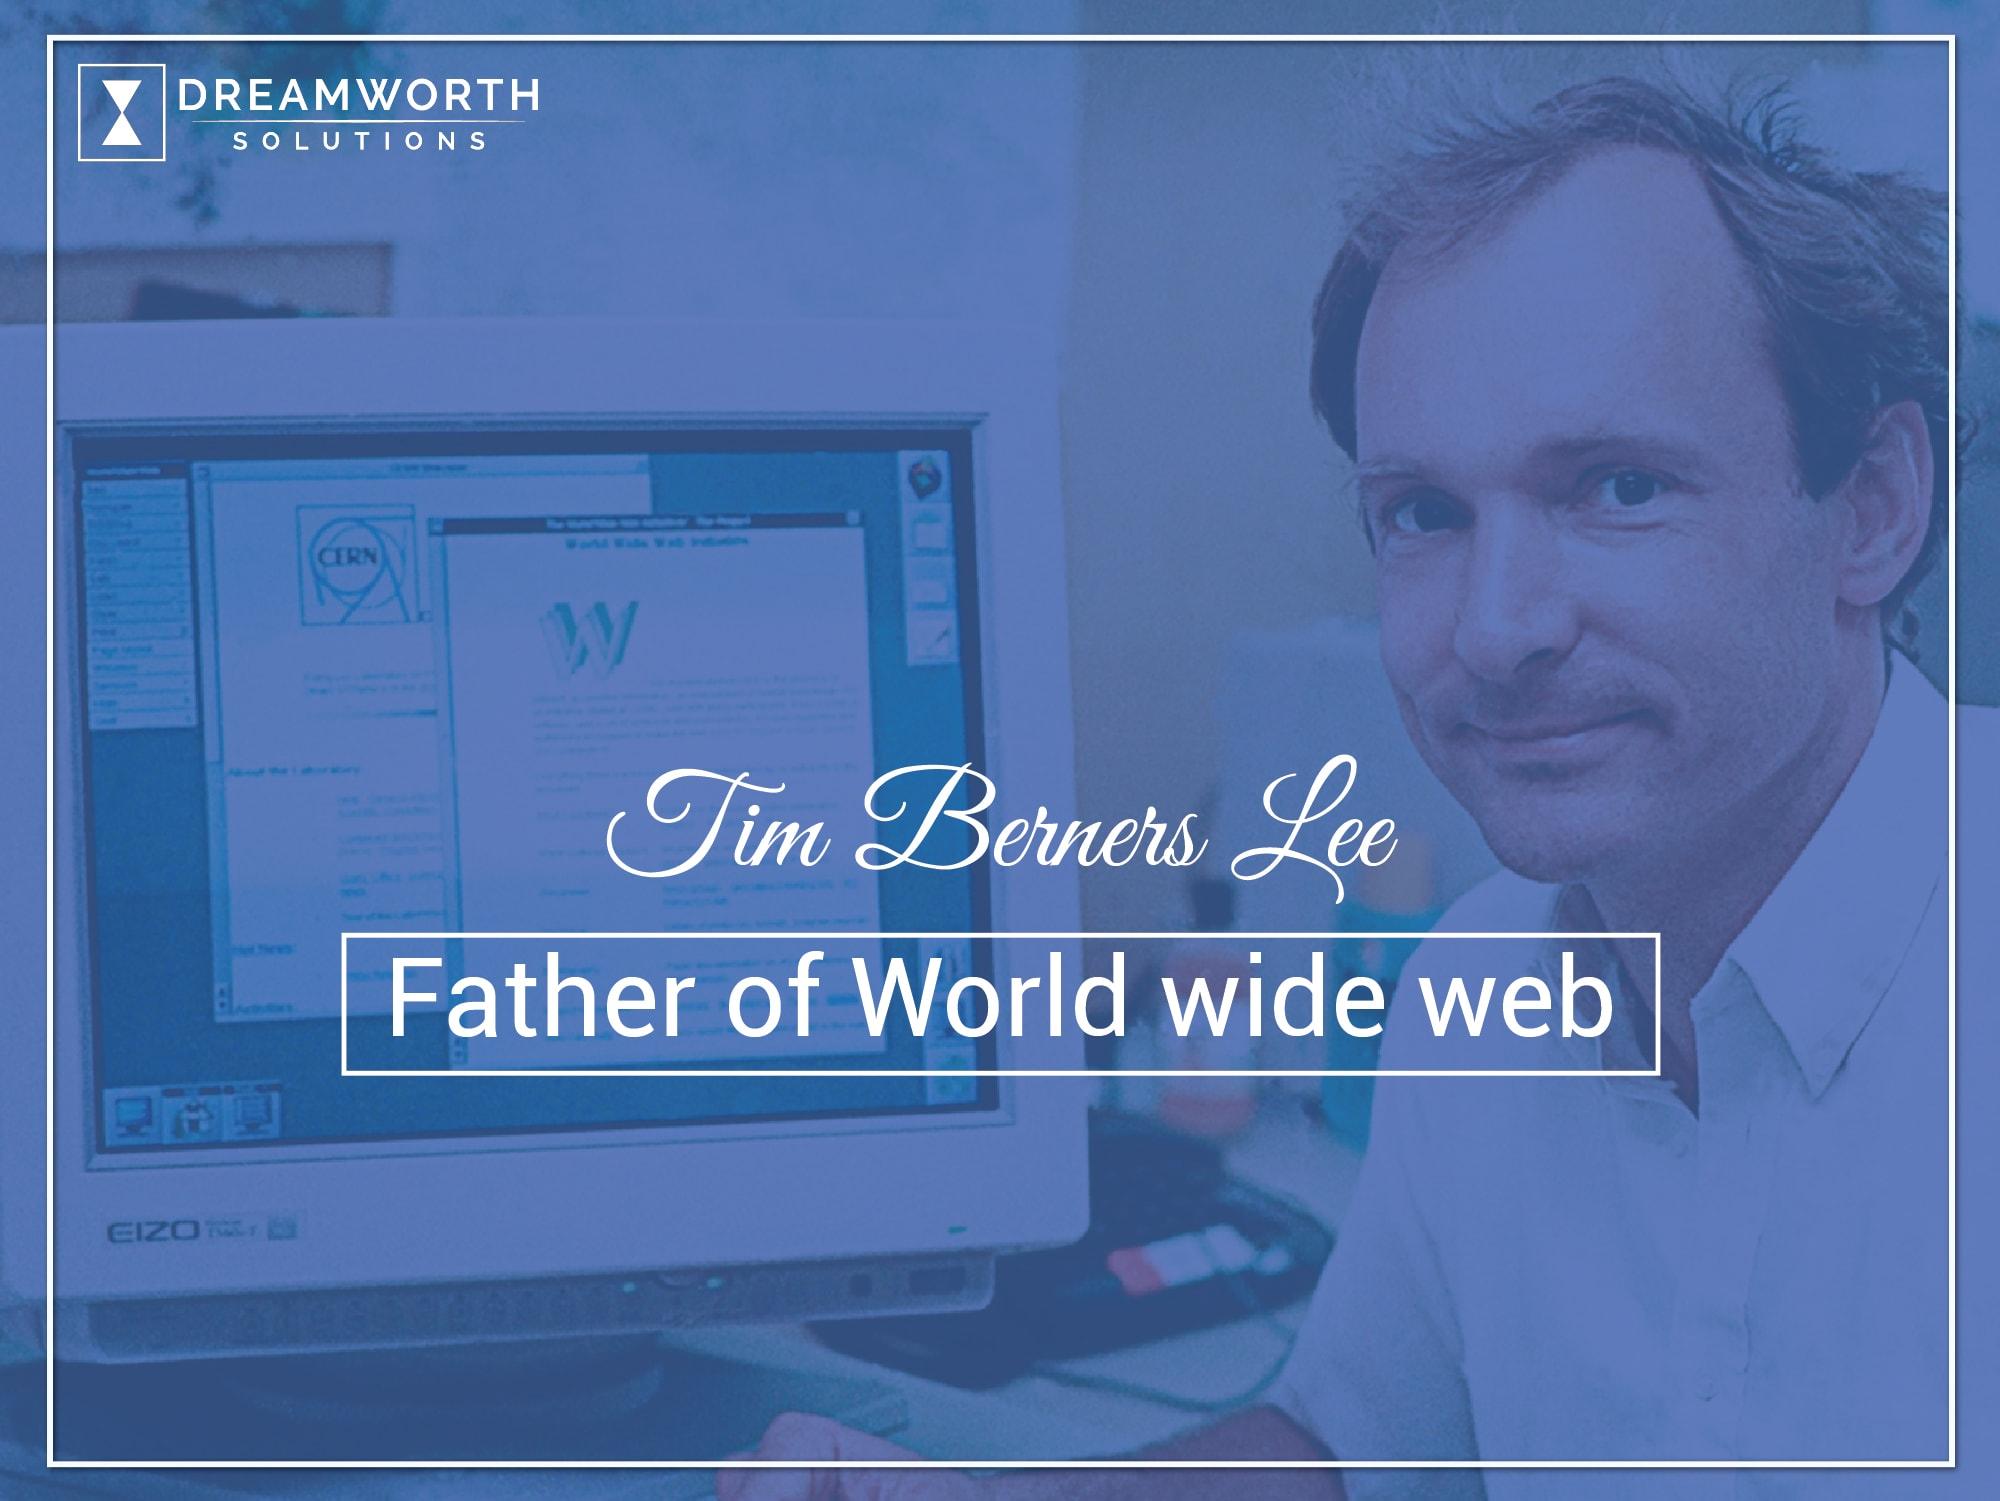 Dreamworth provide top google ranking